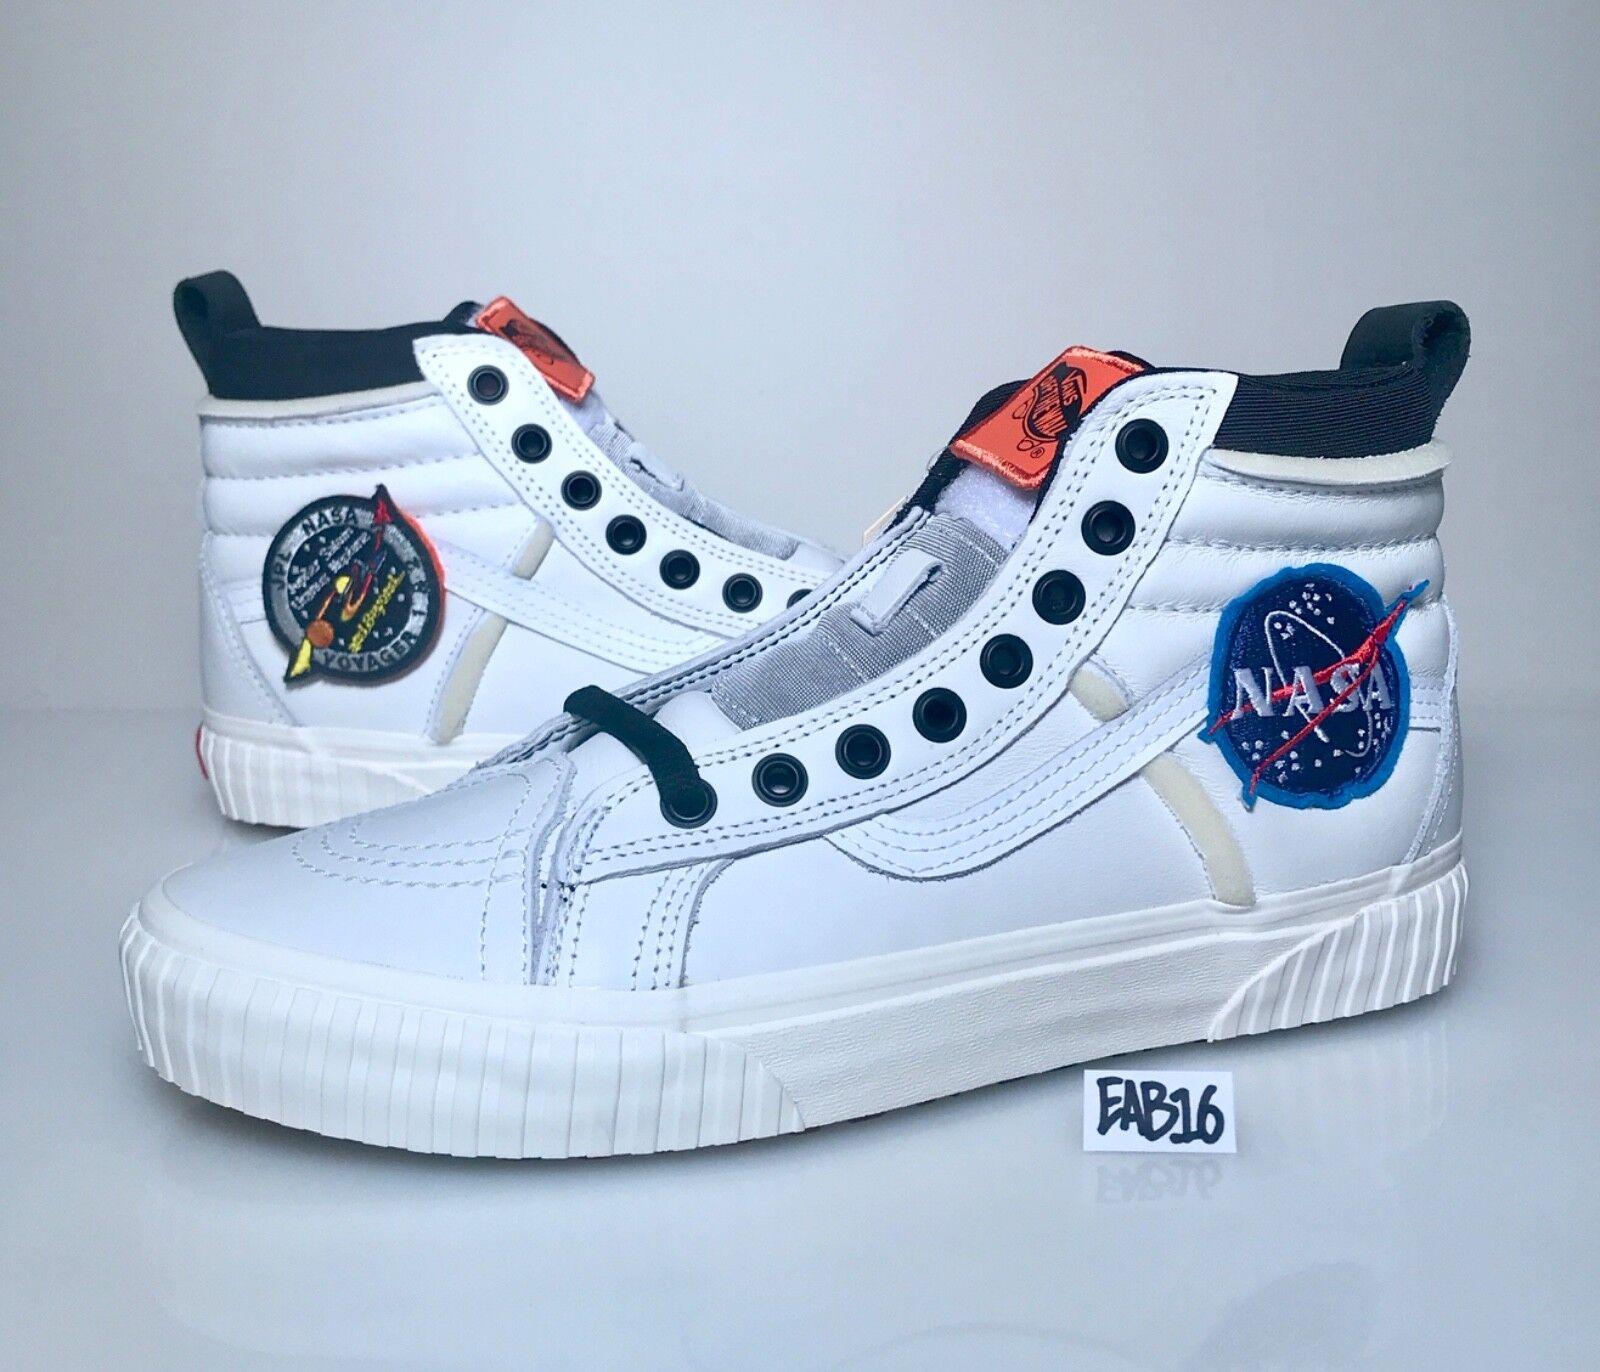 Vans Voyager SK8-HI 46 Mte X Space DX NASA blancoo Naranja VN0A3DO5UO3